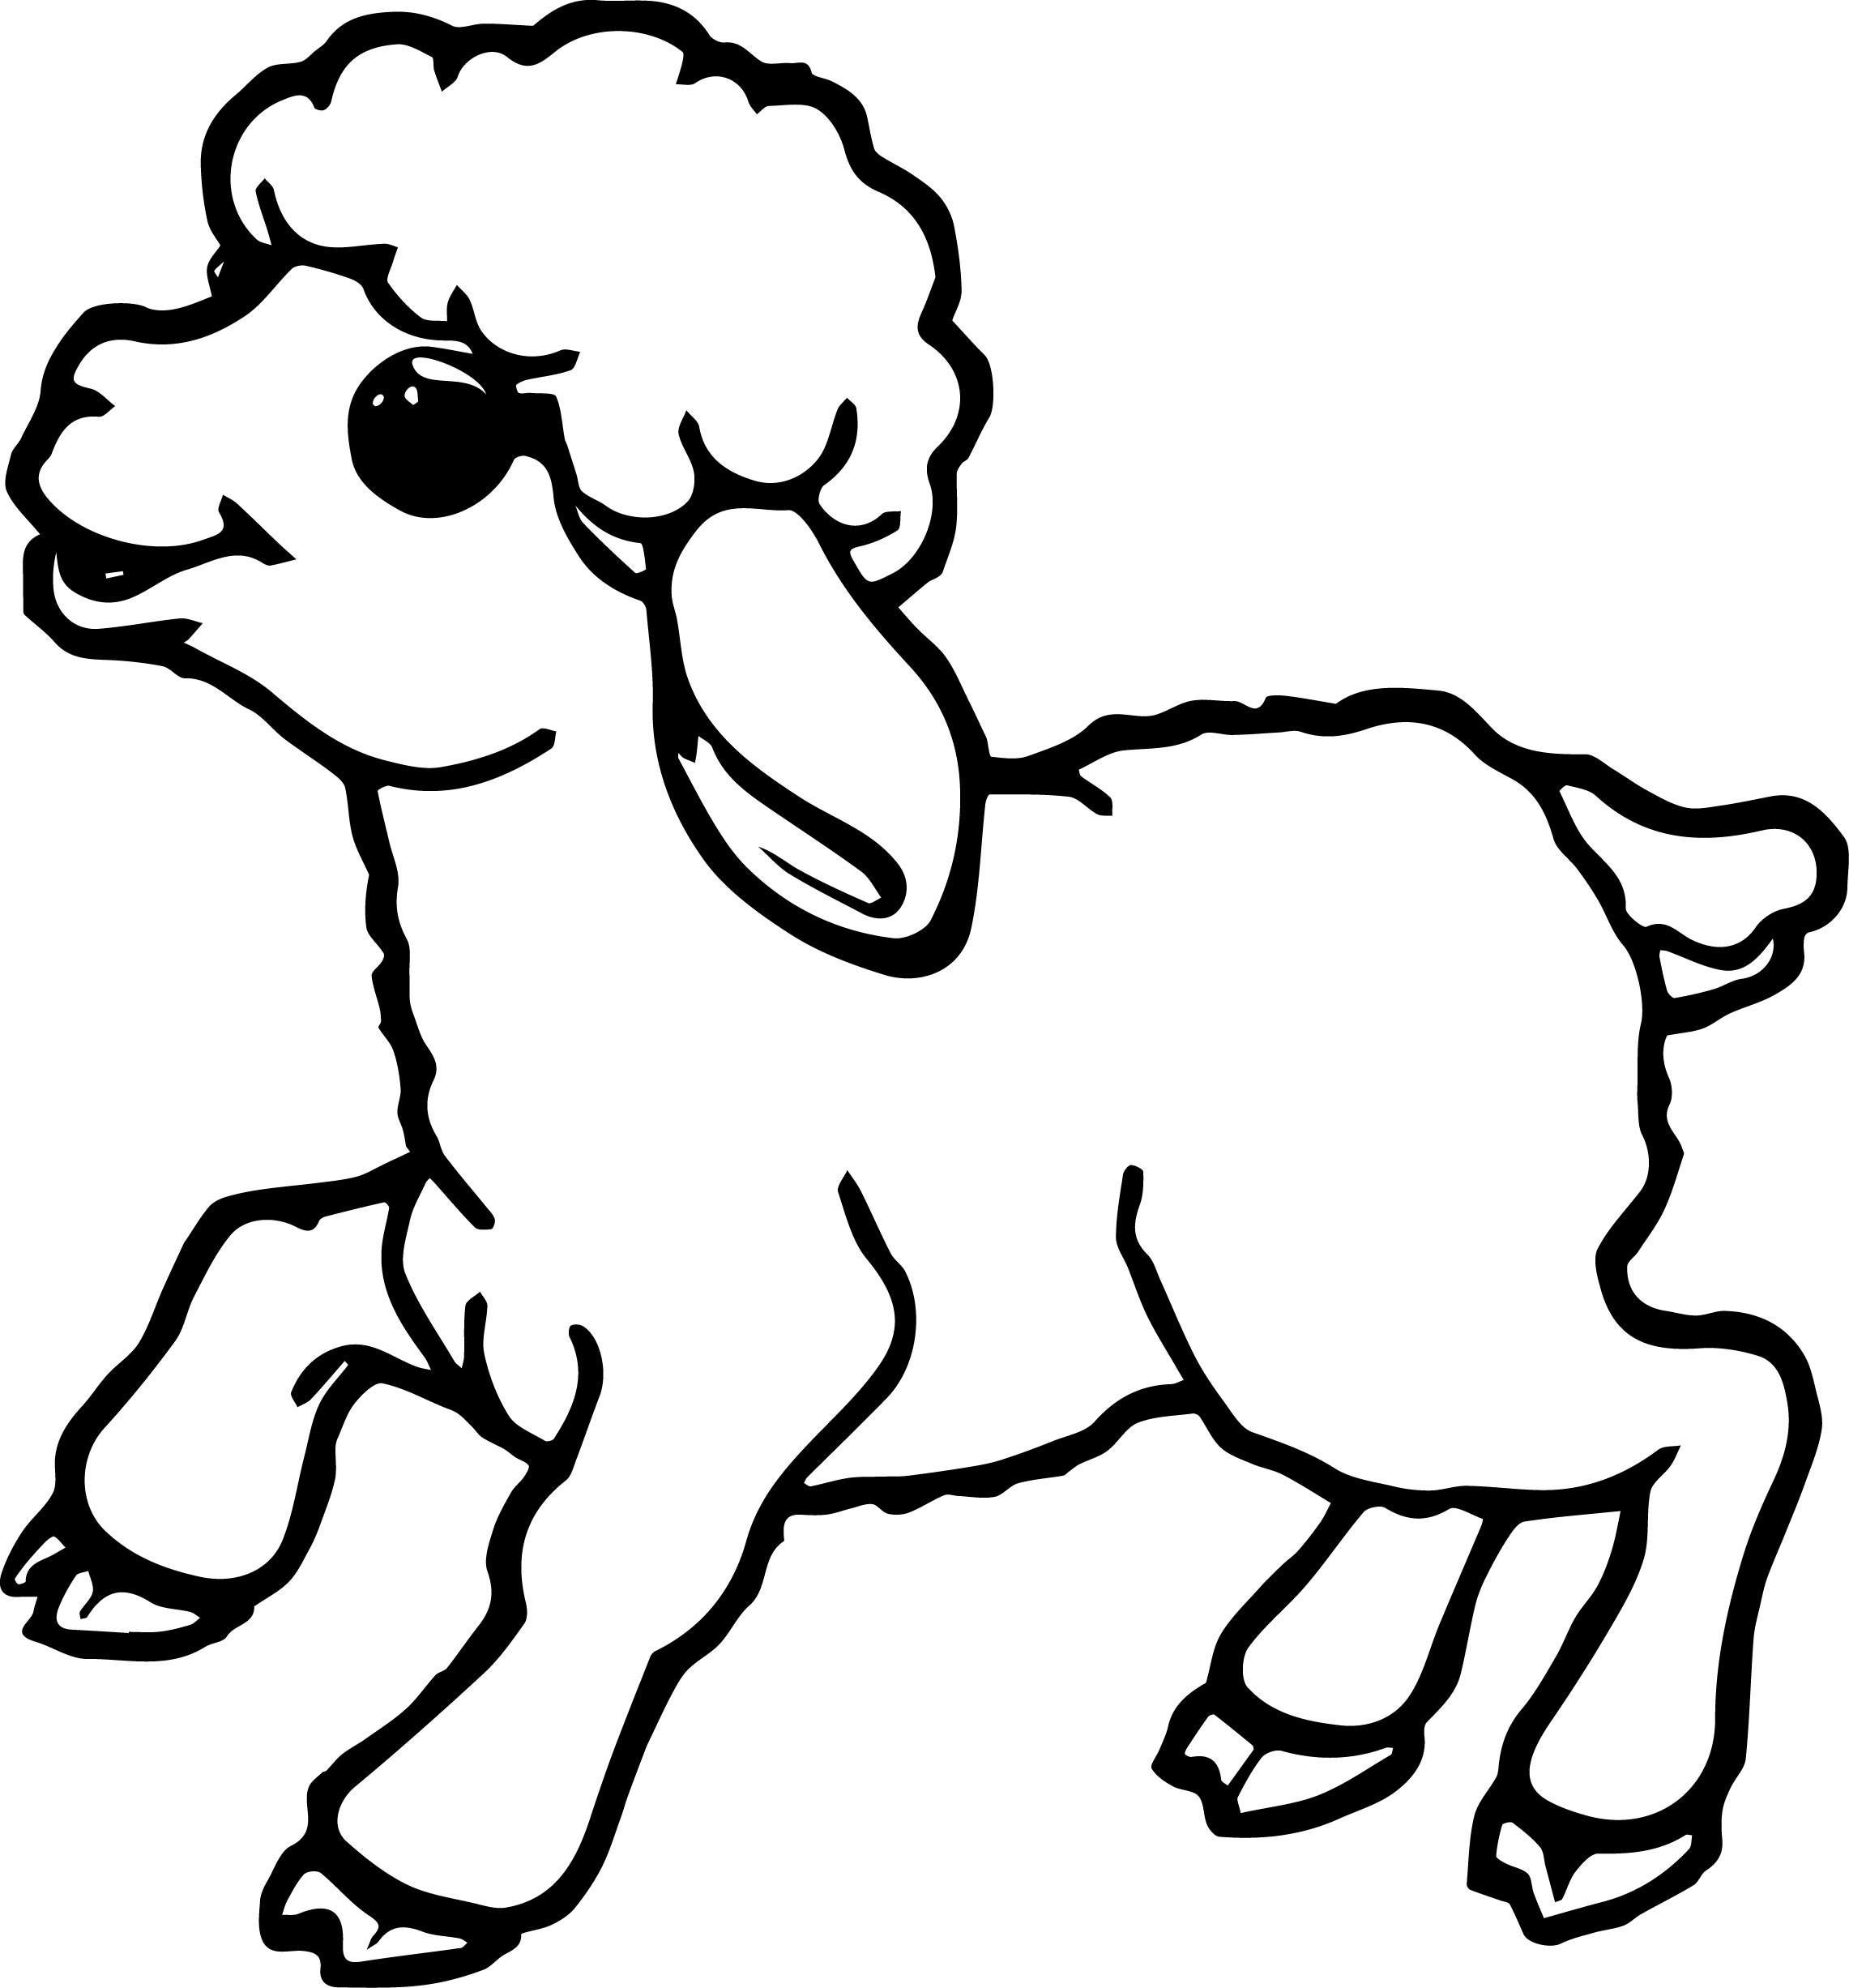 Lamb Outline Drawing at GetDrawings.com | Free for personal use Lamb ... for lamb drawing outline  117dqh